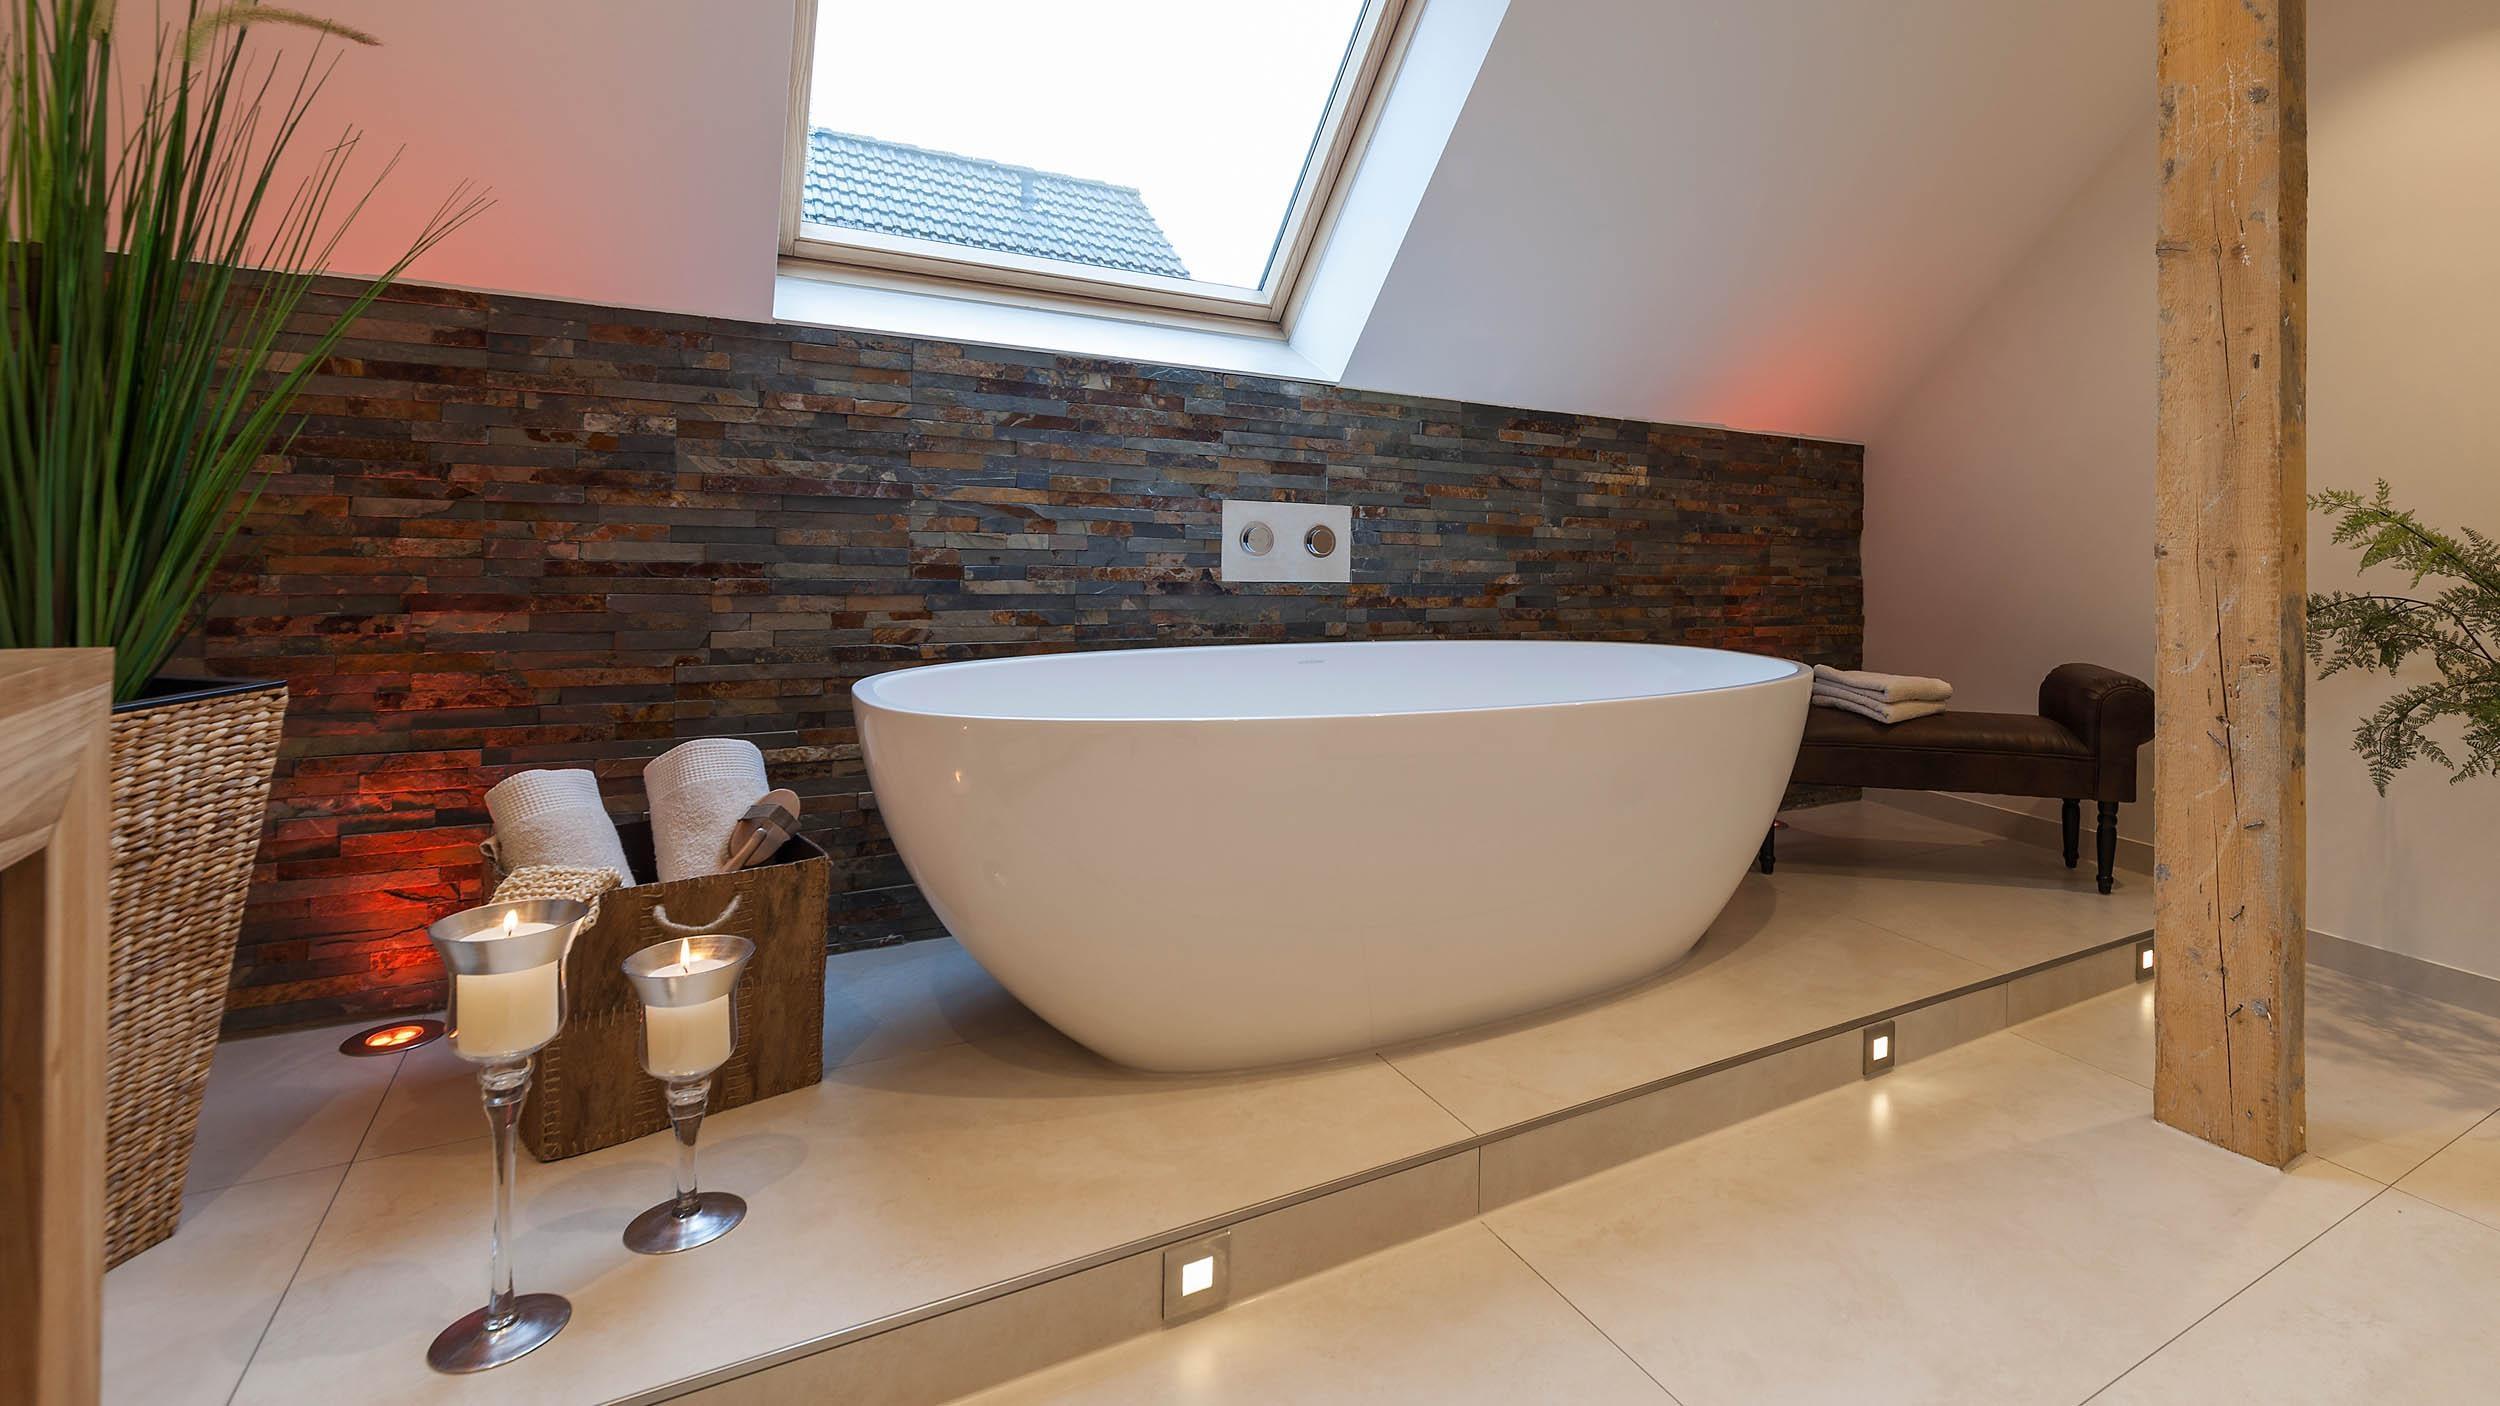 Anzeige- #bestebadstudios #badezimmer #bad #badewan...